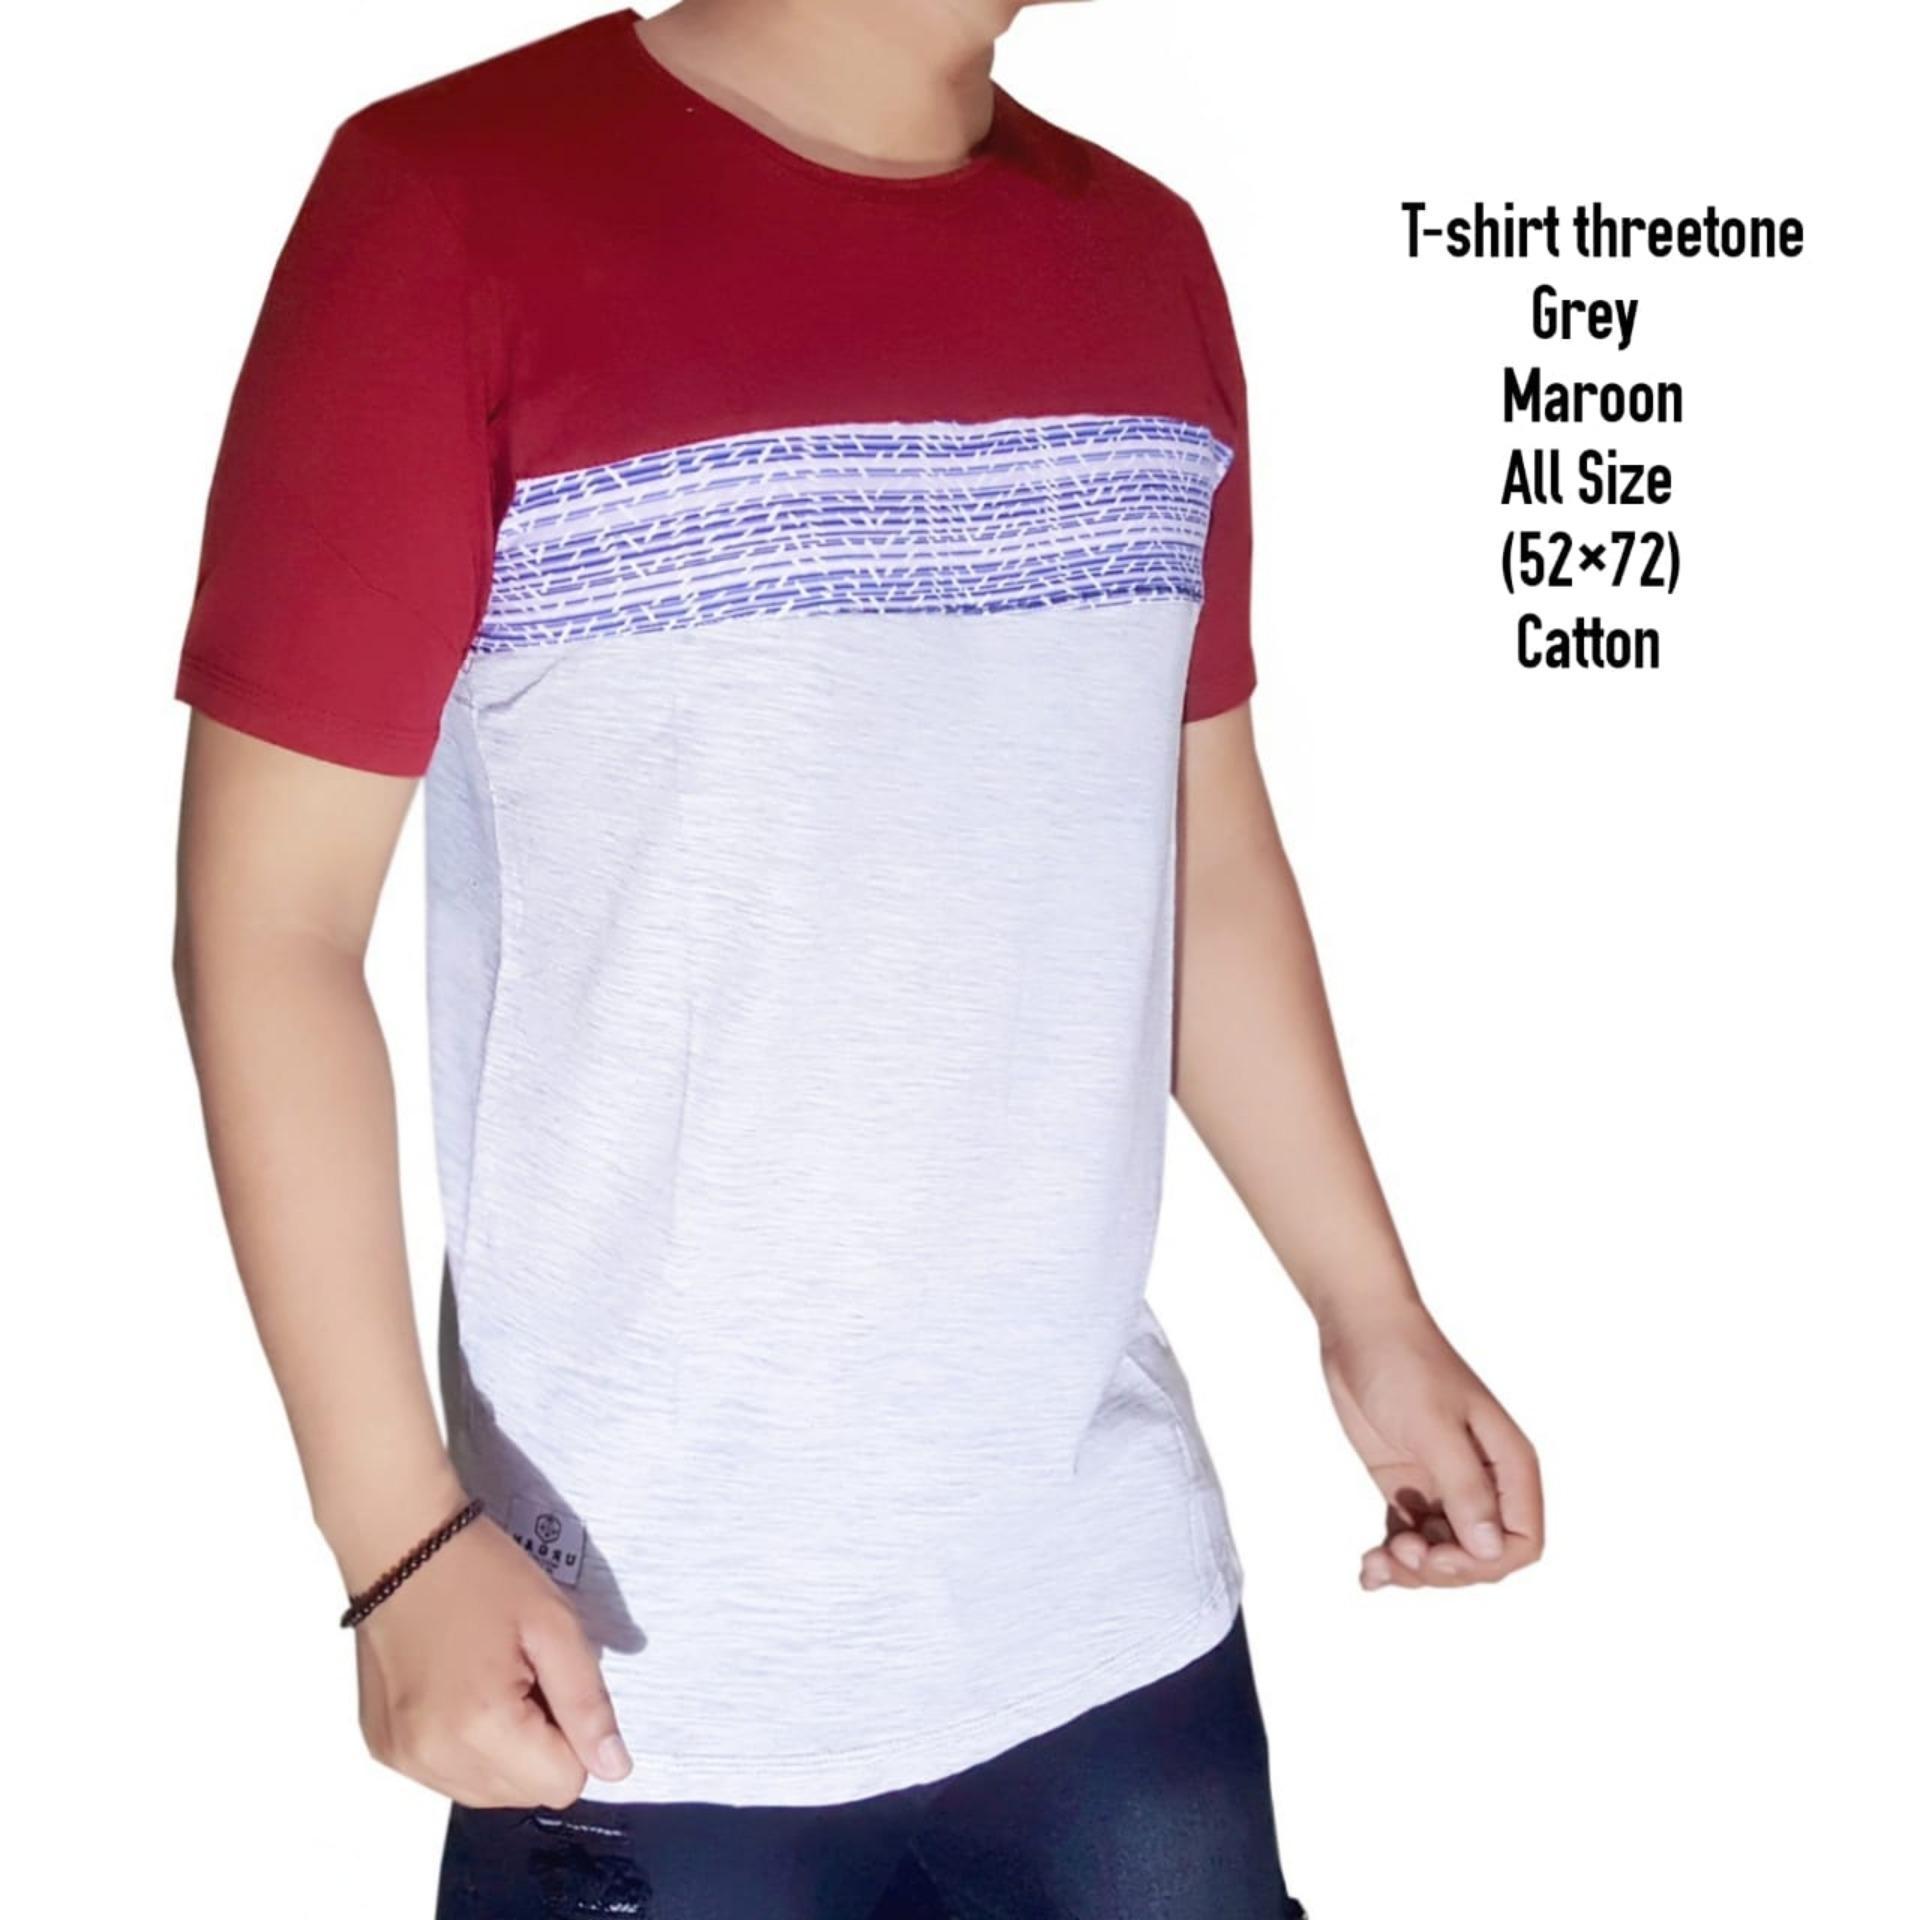 Rp40.000Anugrahshop – kaos distro T-shirt Fashion 100% soft cotton combed 30s premium pria wanita cewe cowo baju T-shirt terbaru kekinian lengan keren ...